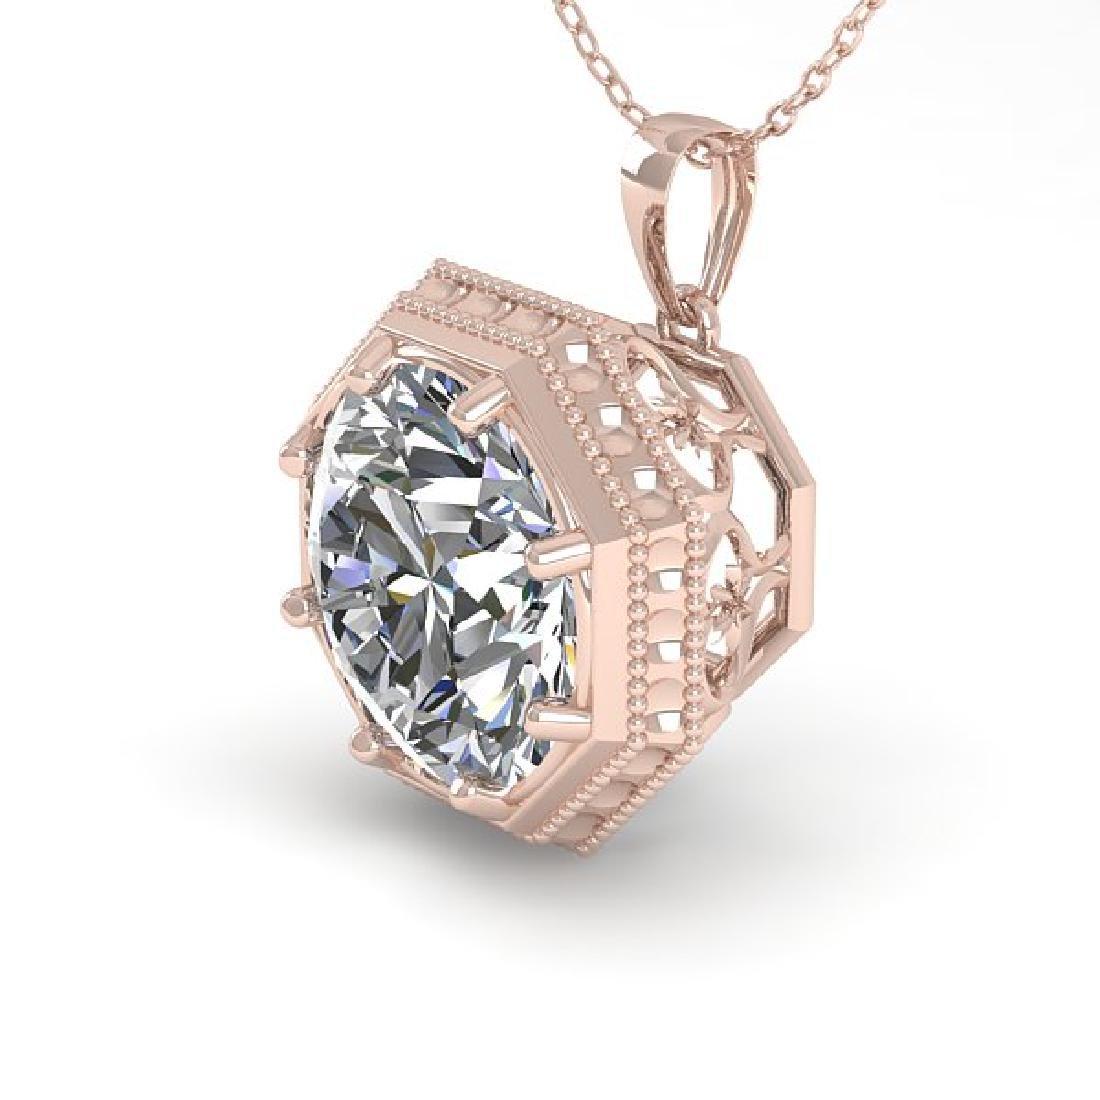 1 CTW VS/SI Diamond Solitaire Necklace 14K Rose Gold